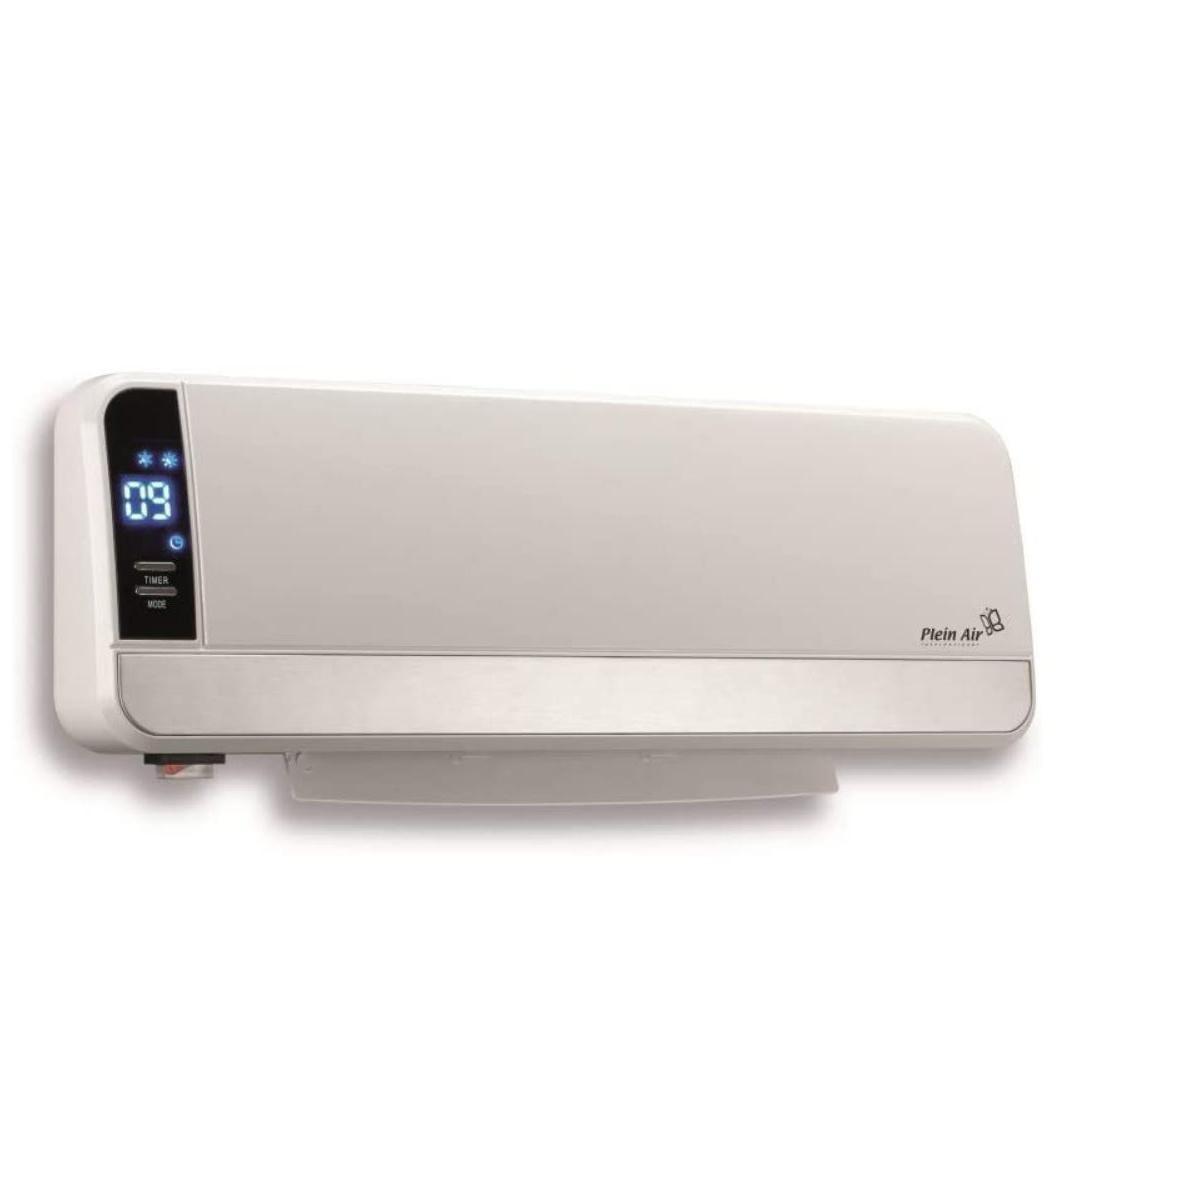 Plein Air Chauffage convecteur MURAL 2000W Ceramique Programmable Ecran Digital Télécommande PLEIN AIR